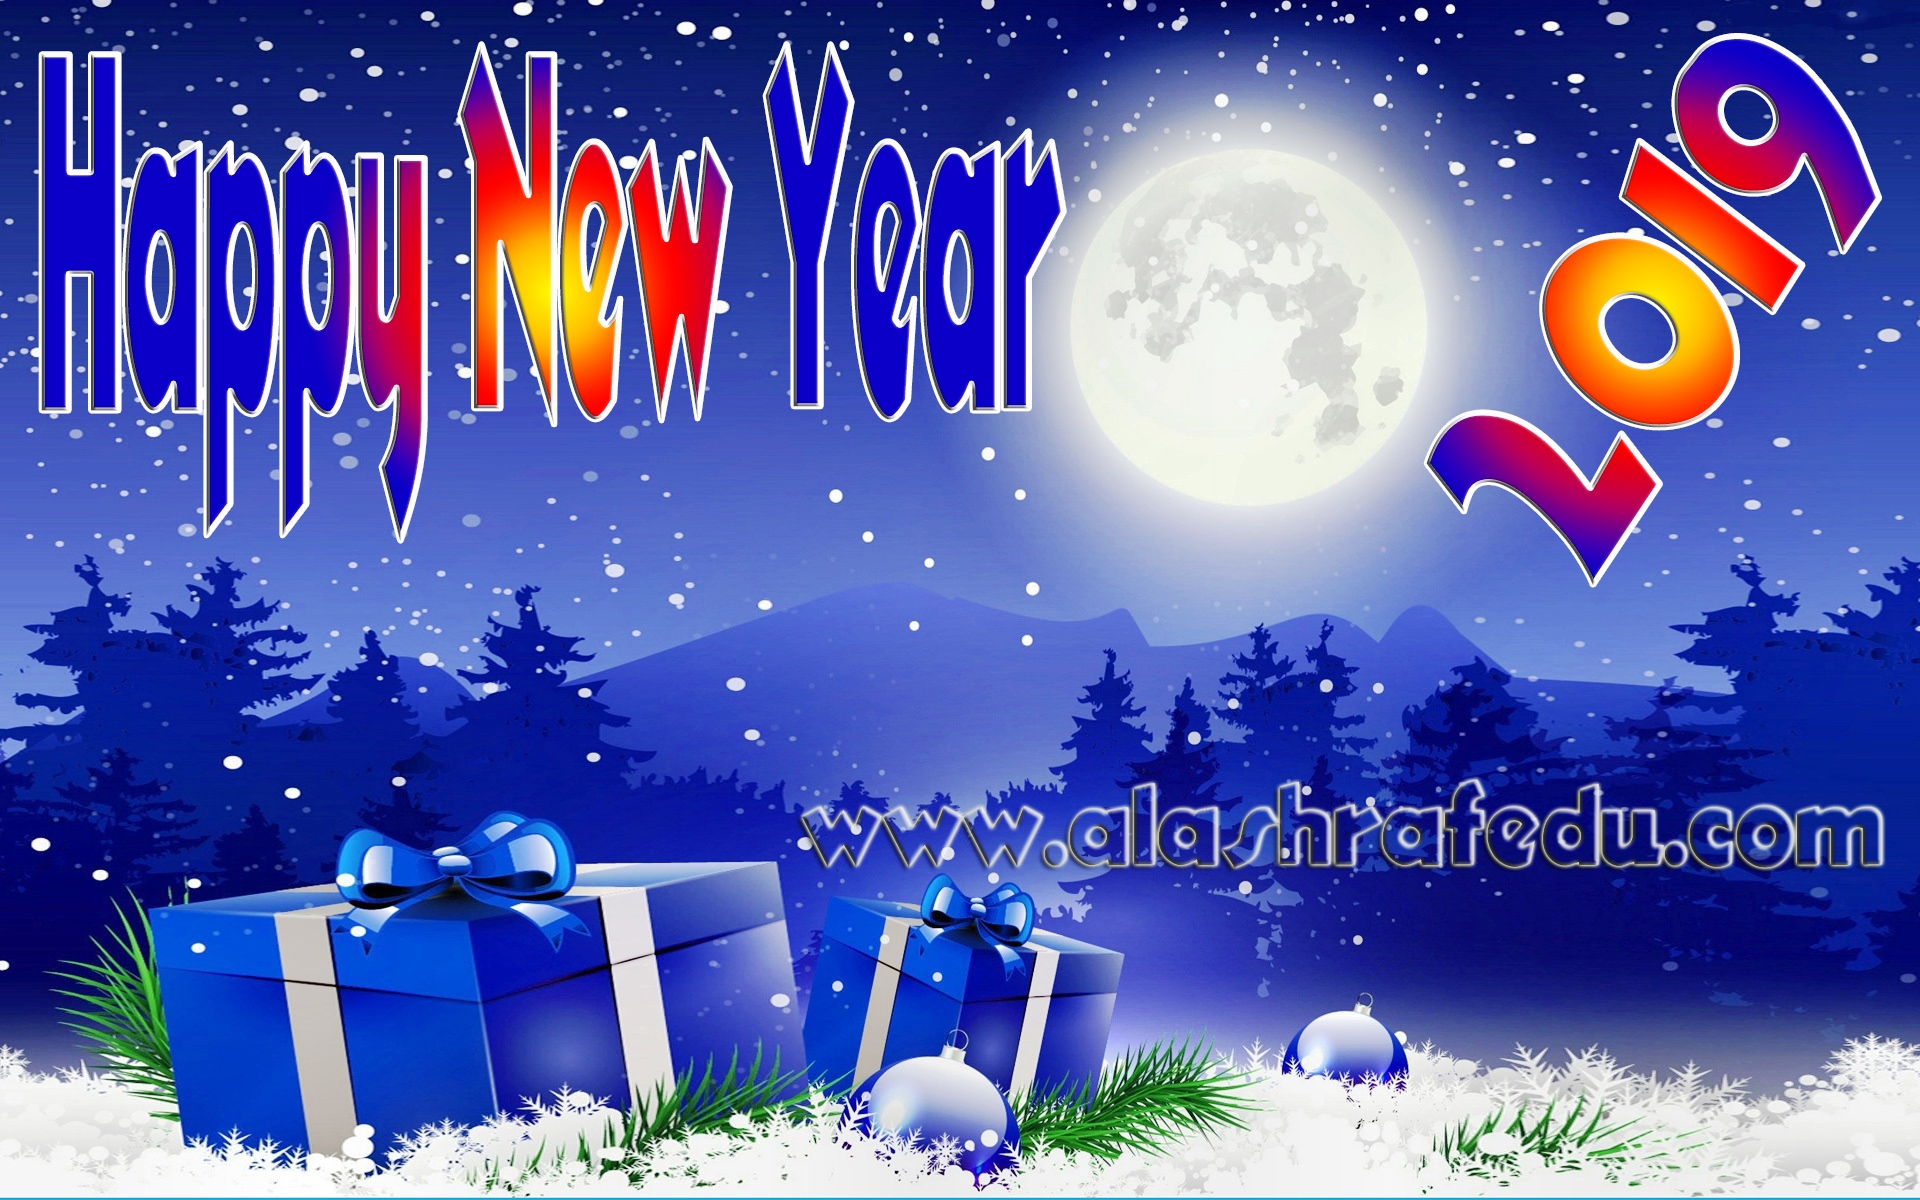 Christmas Winter Moon Gifts Wallpaper Desktop 2019 www.alashrafedu.com1